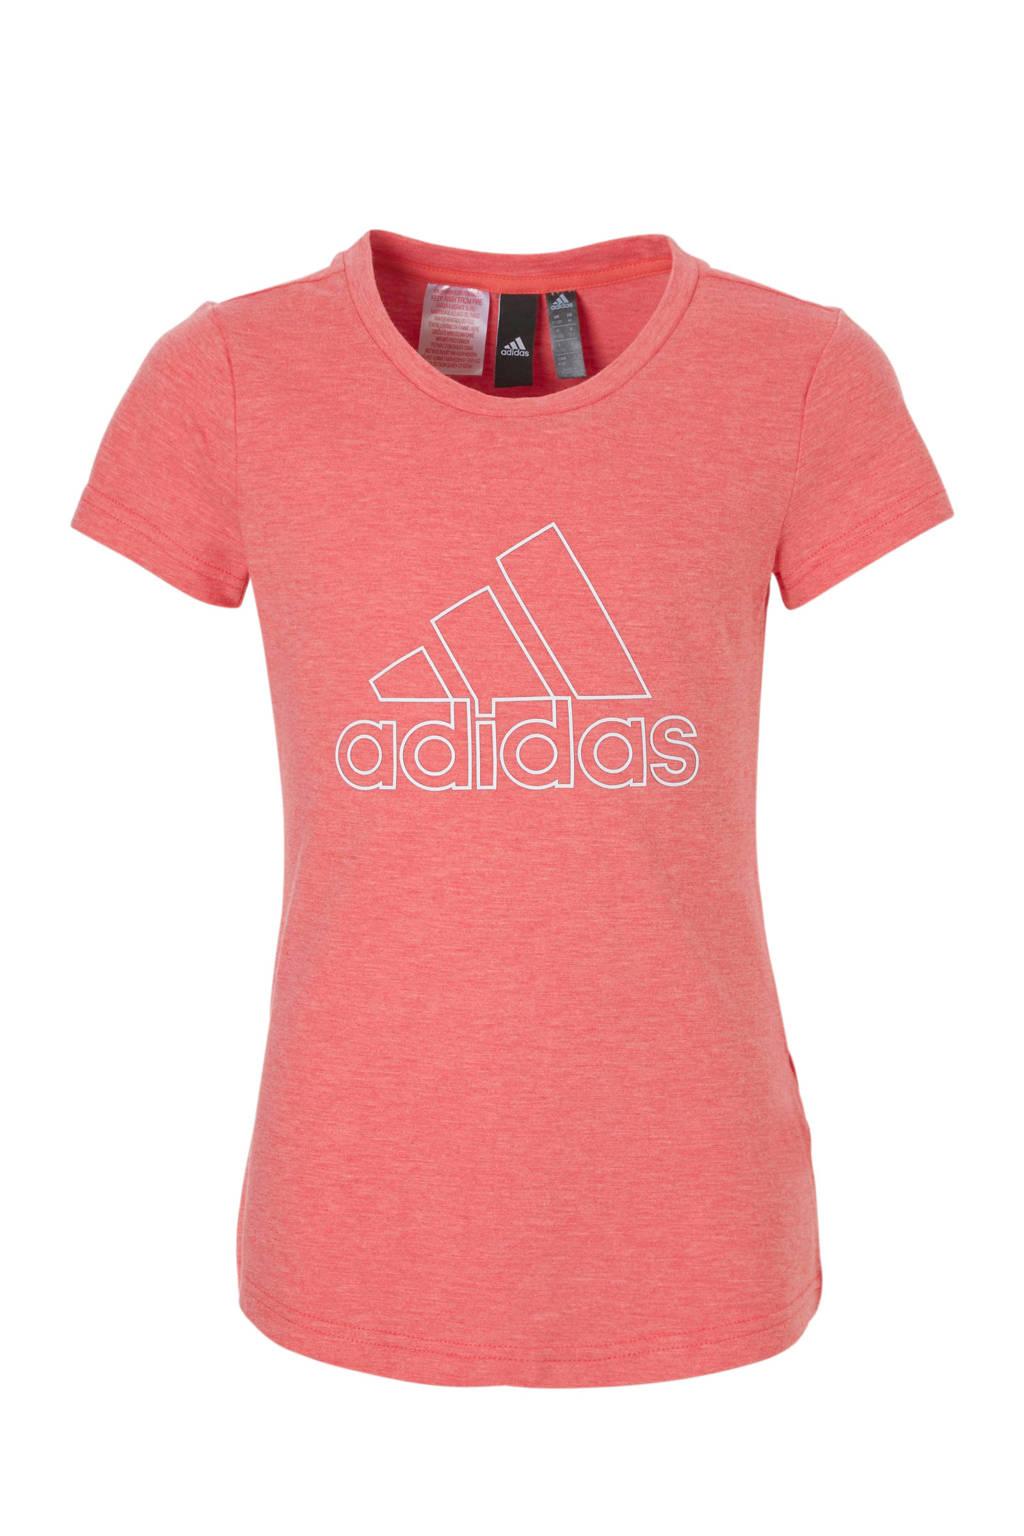 adidas performance sport T-shirt, Roze/wit